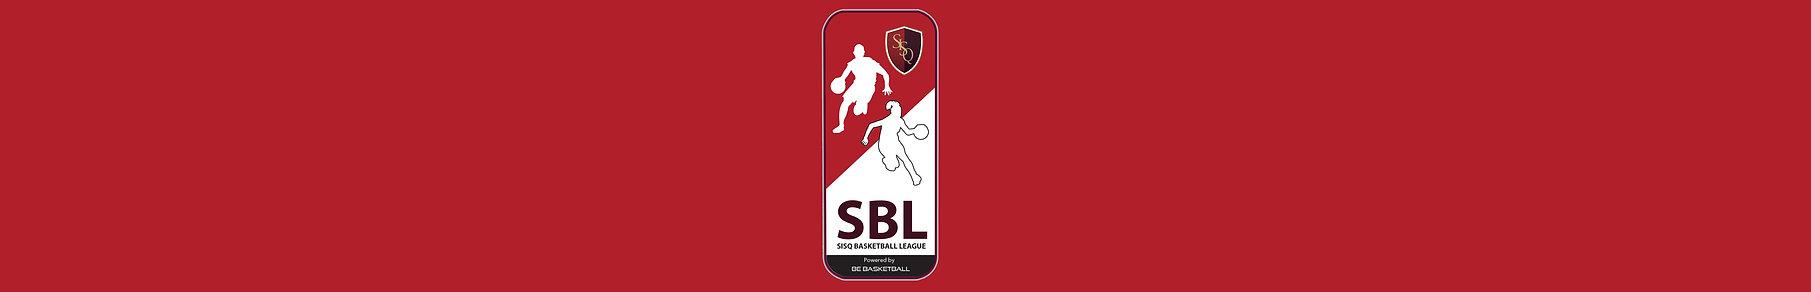 SBL 2.jpg